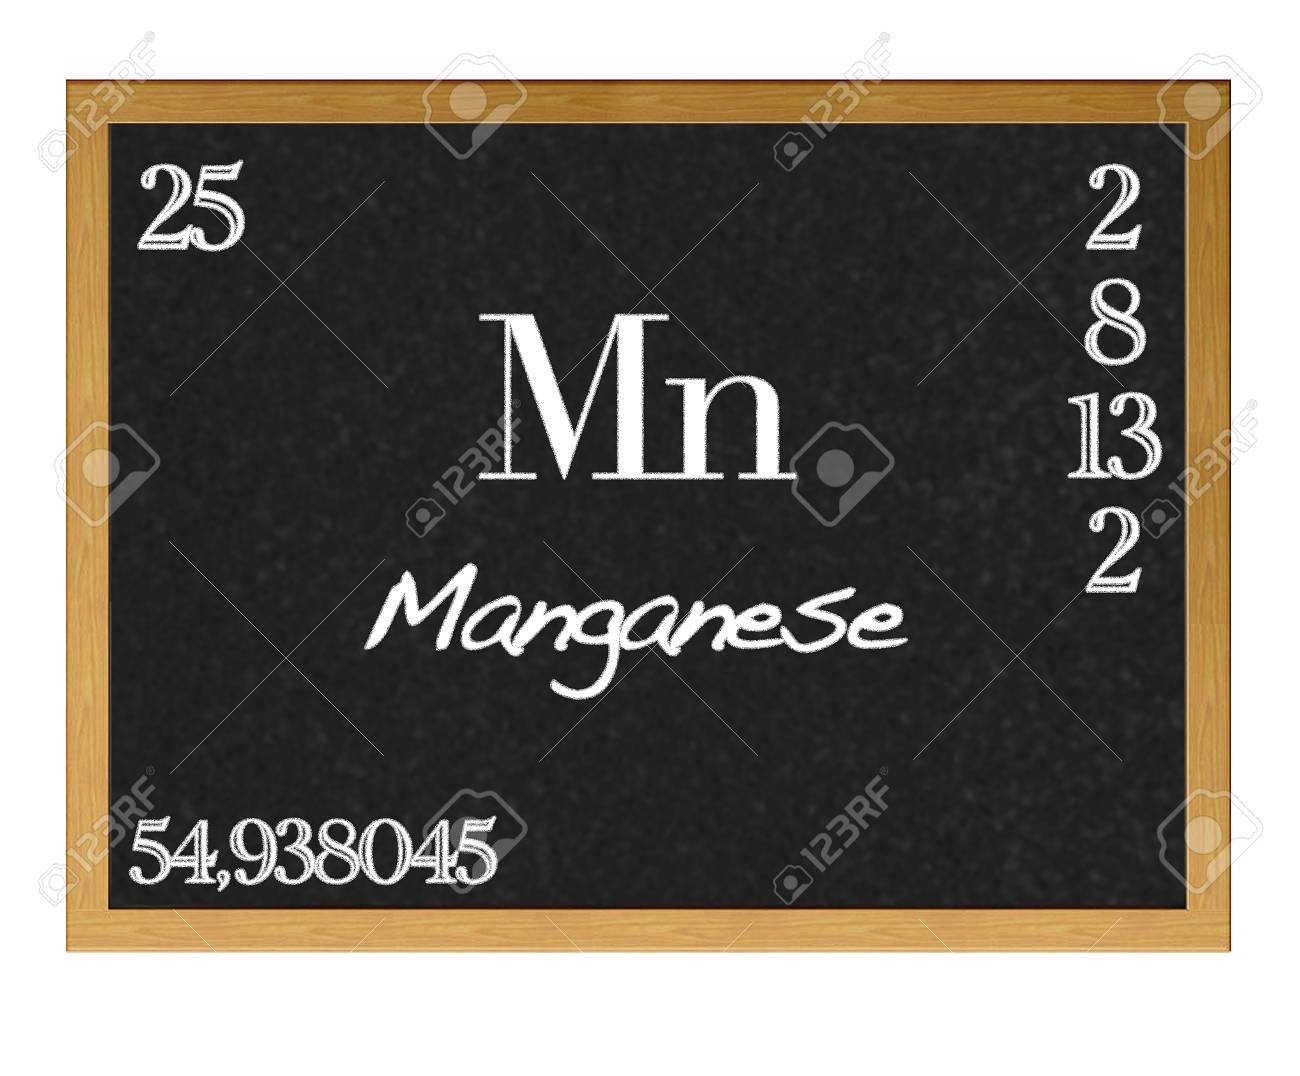 Pizarra aislada con la tabla peridica manganeso fotos retratos pizarra aislada con la tabla peridica manganeso foto de archivo 13123350 urtaz Images